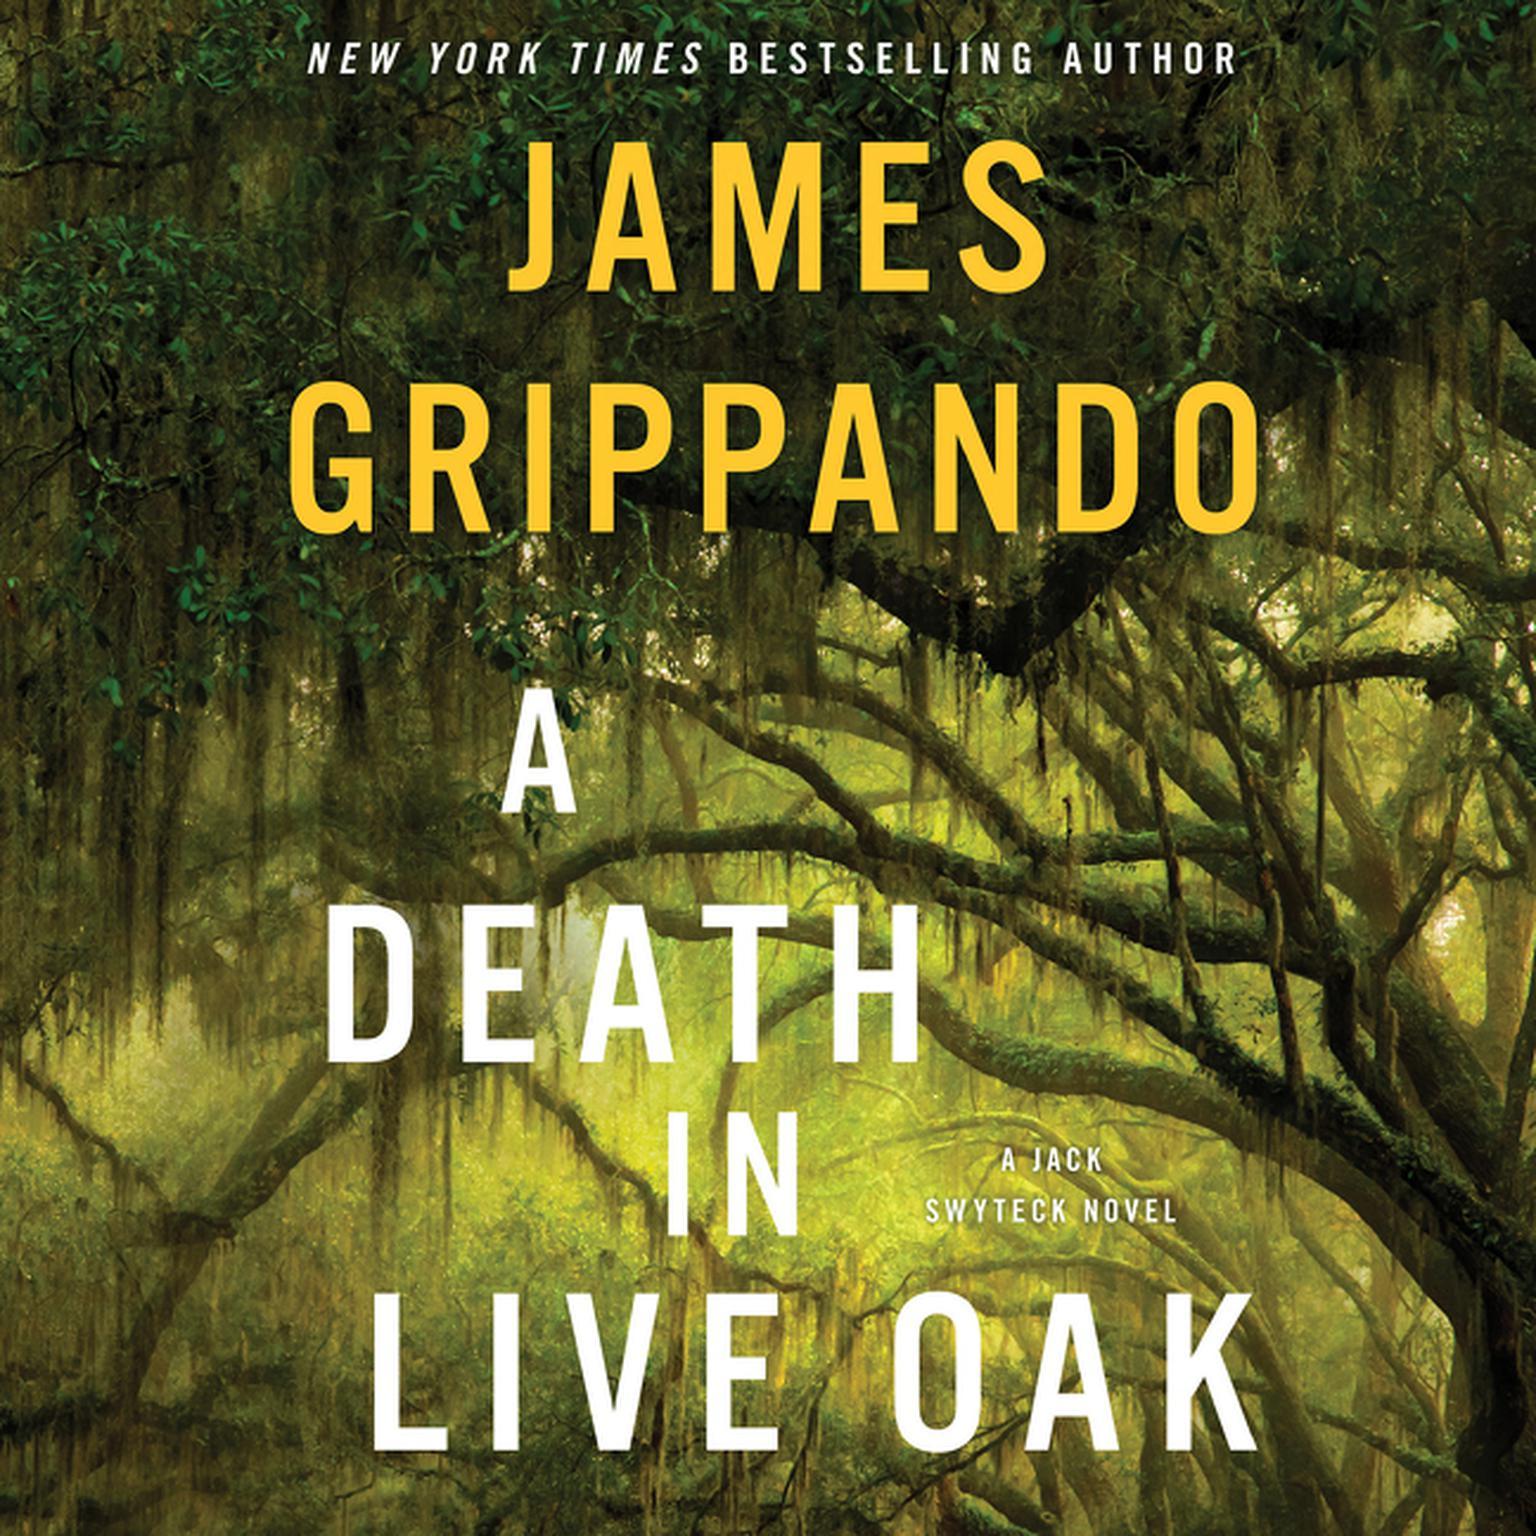 A Death in Live Oak: A Jack Swyteck Novel Audiobook, by James Grippando